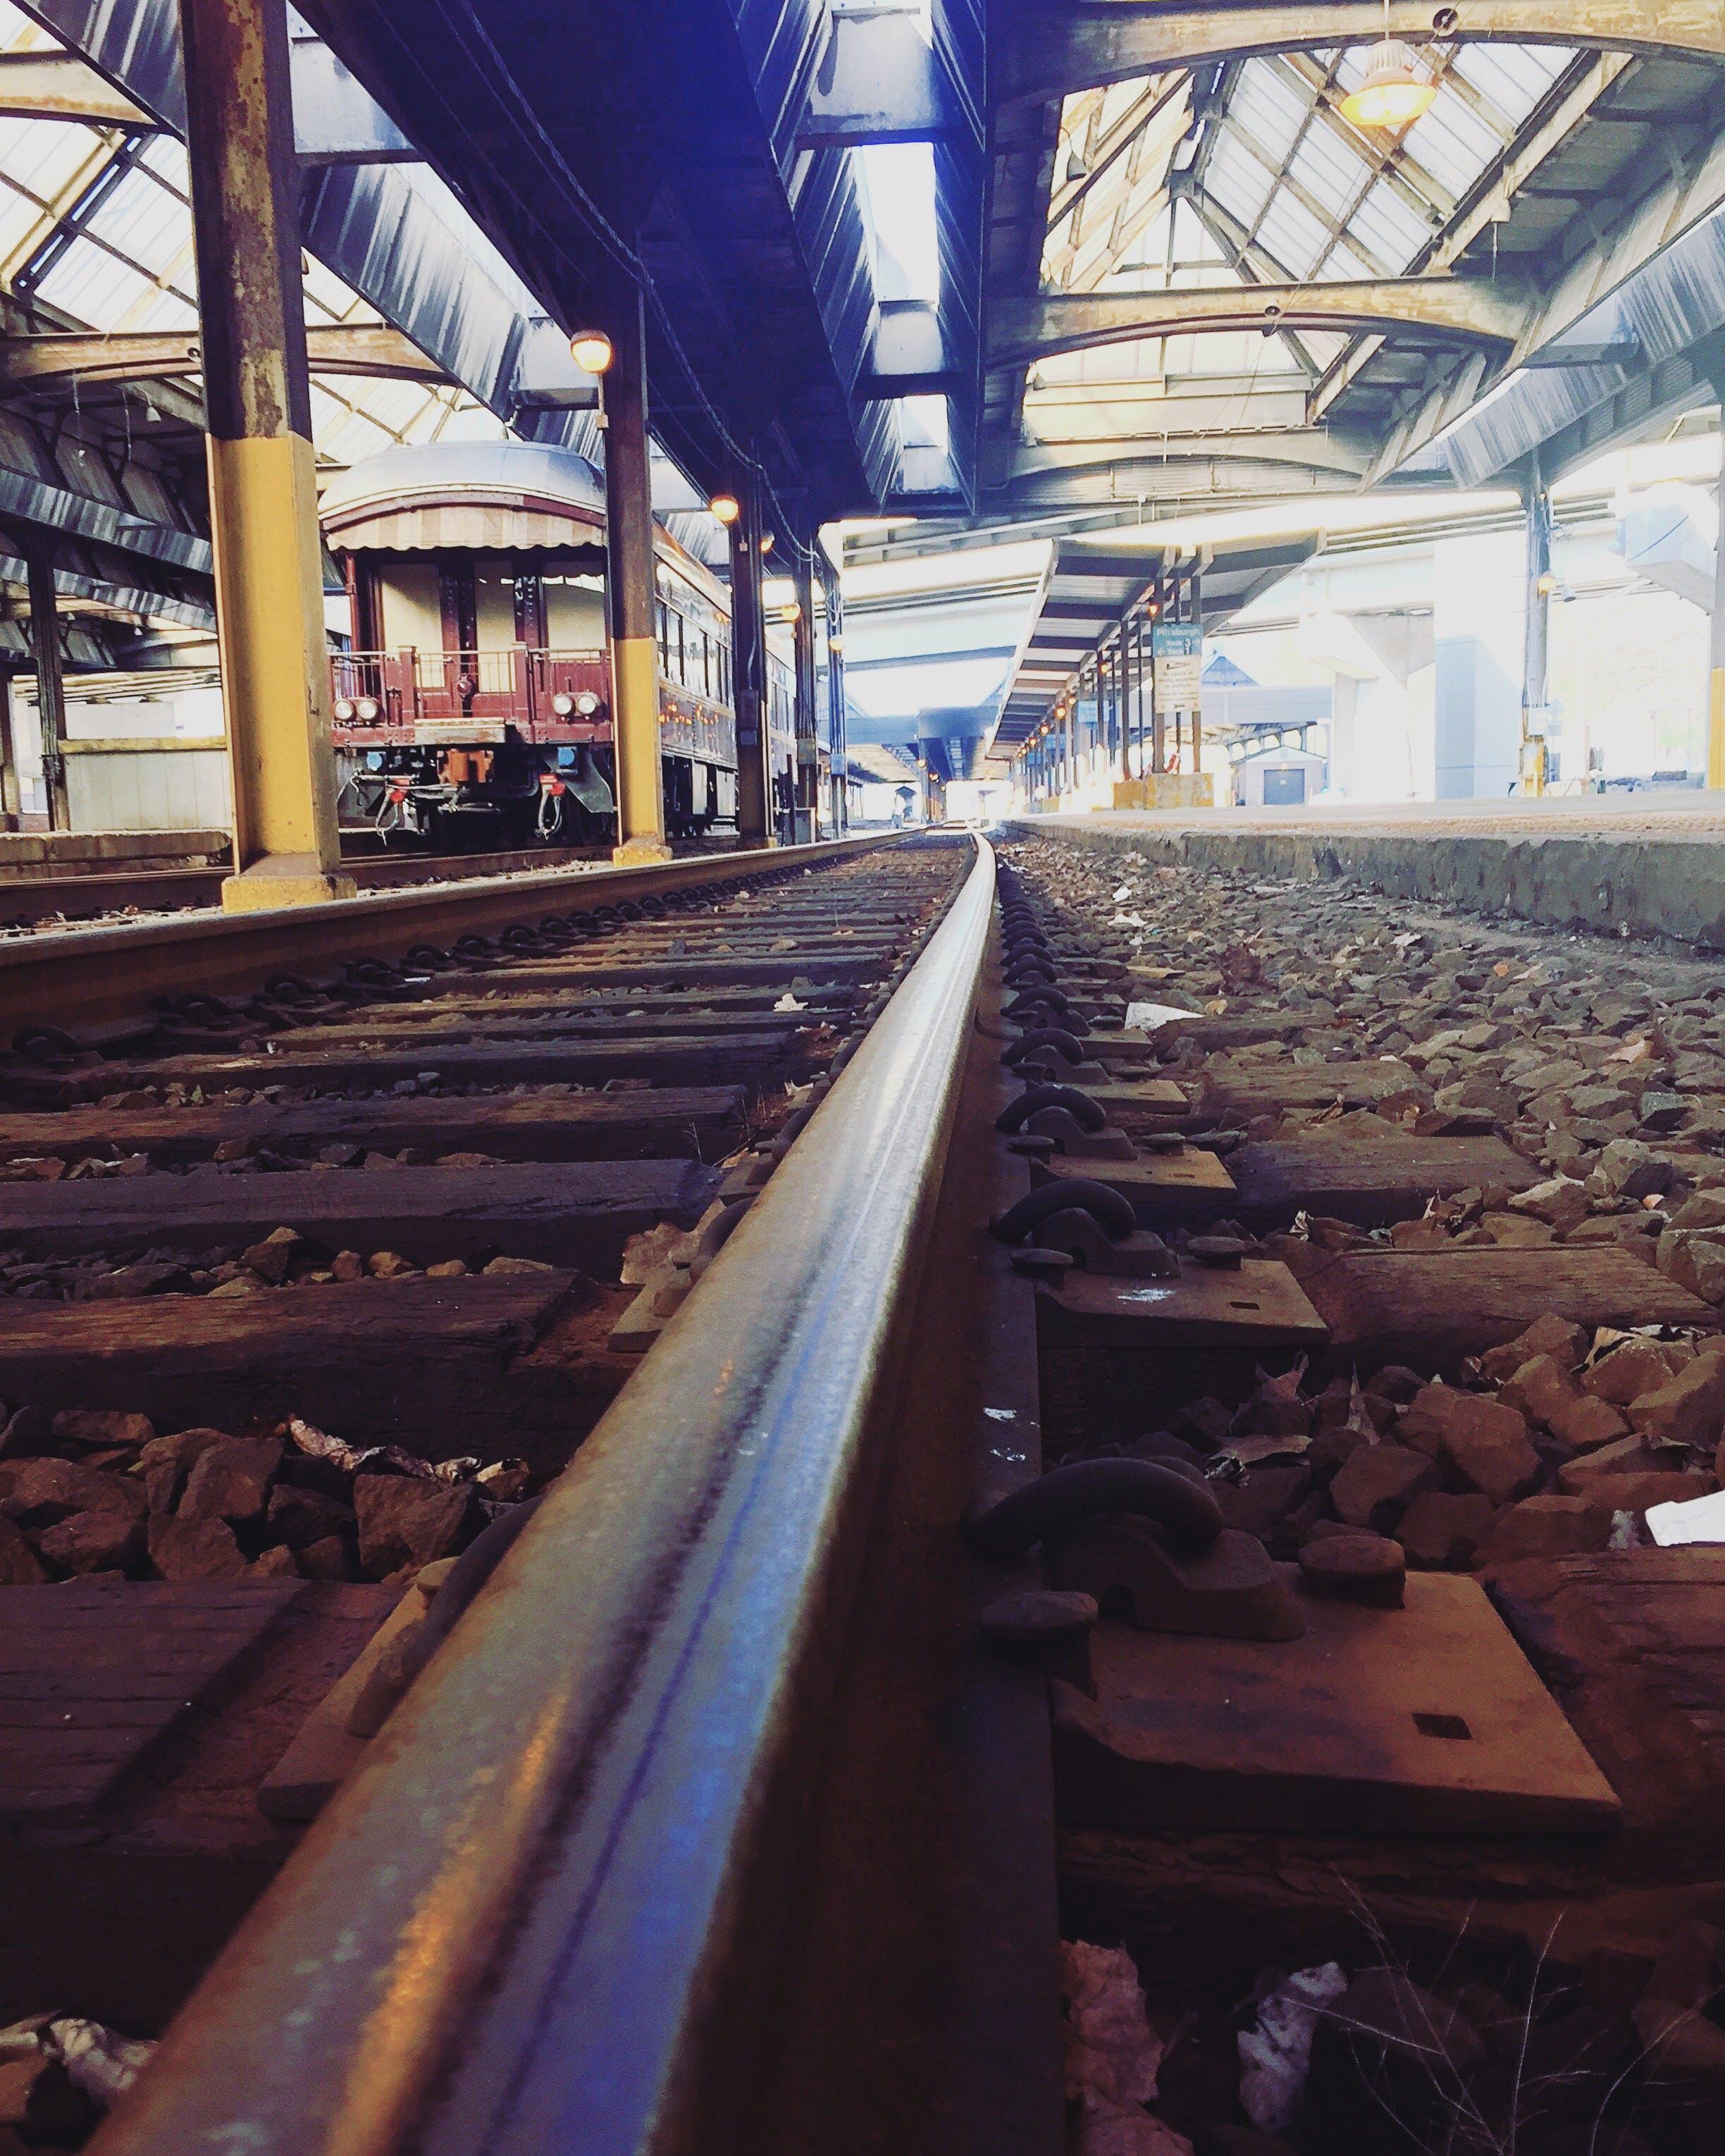 Trail Rail Near Cement Way during Daytime